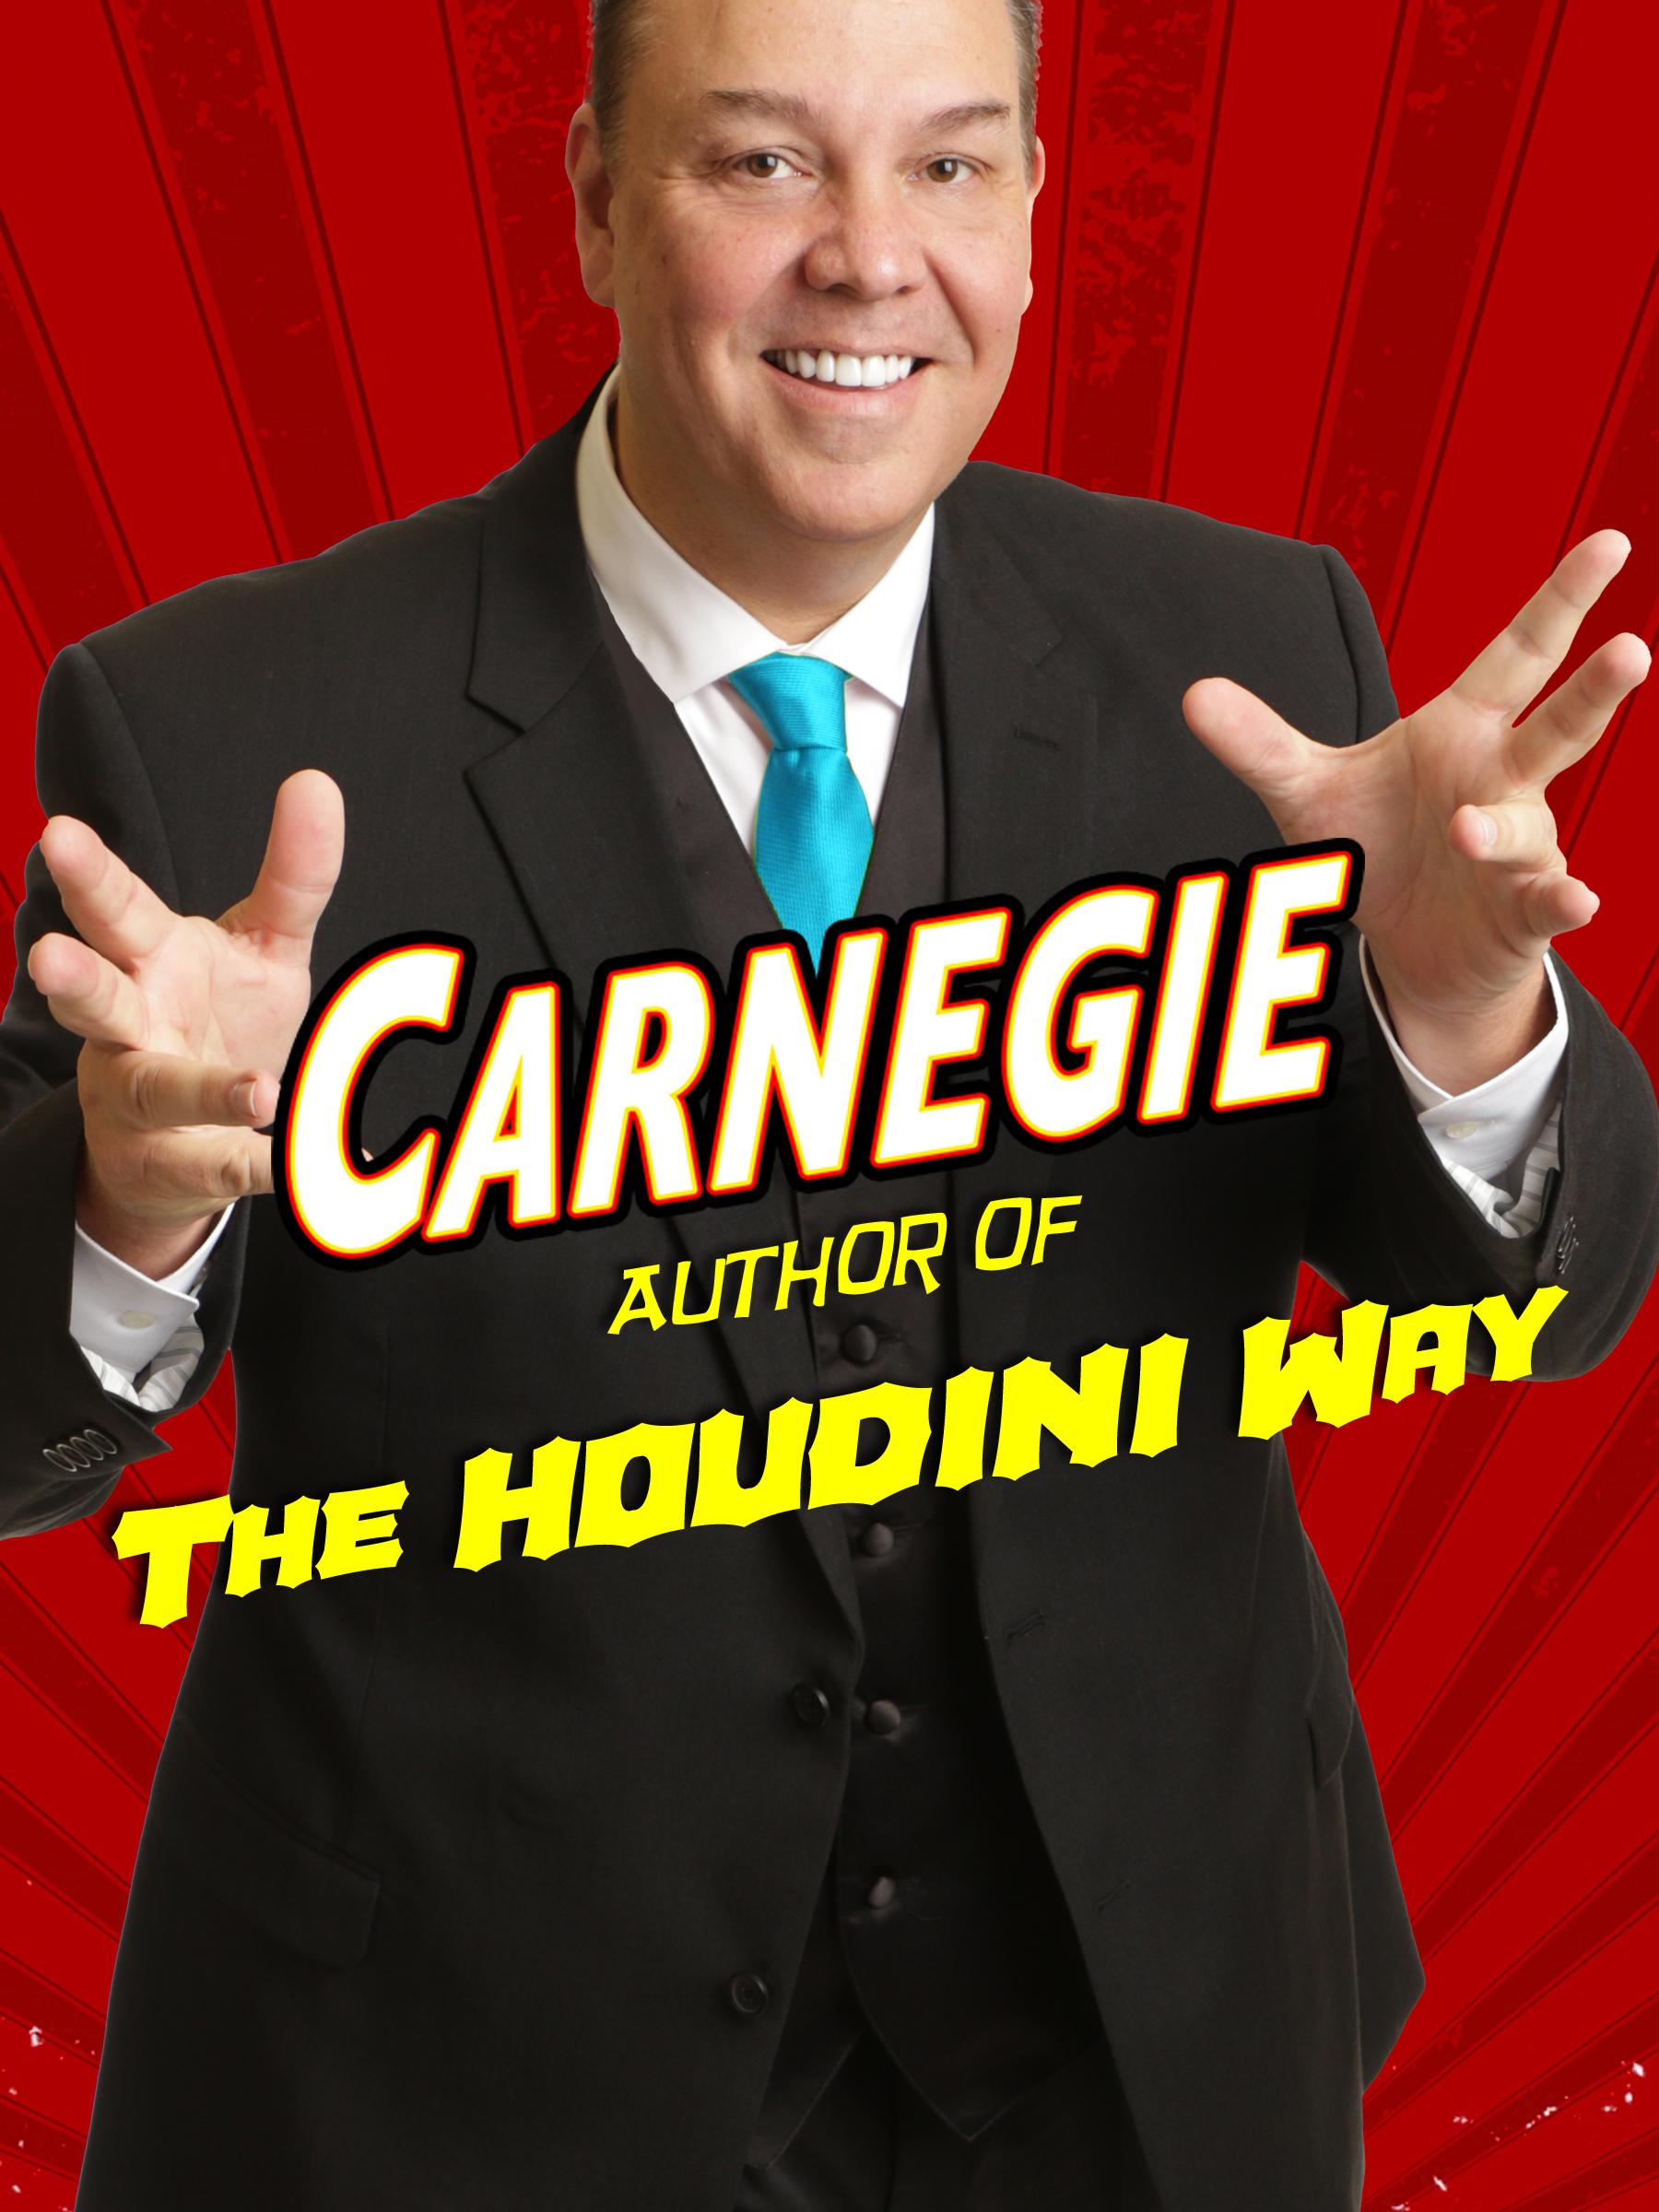 Houdini Marketing Key Note | The Houdini Marketing Book